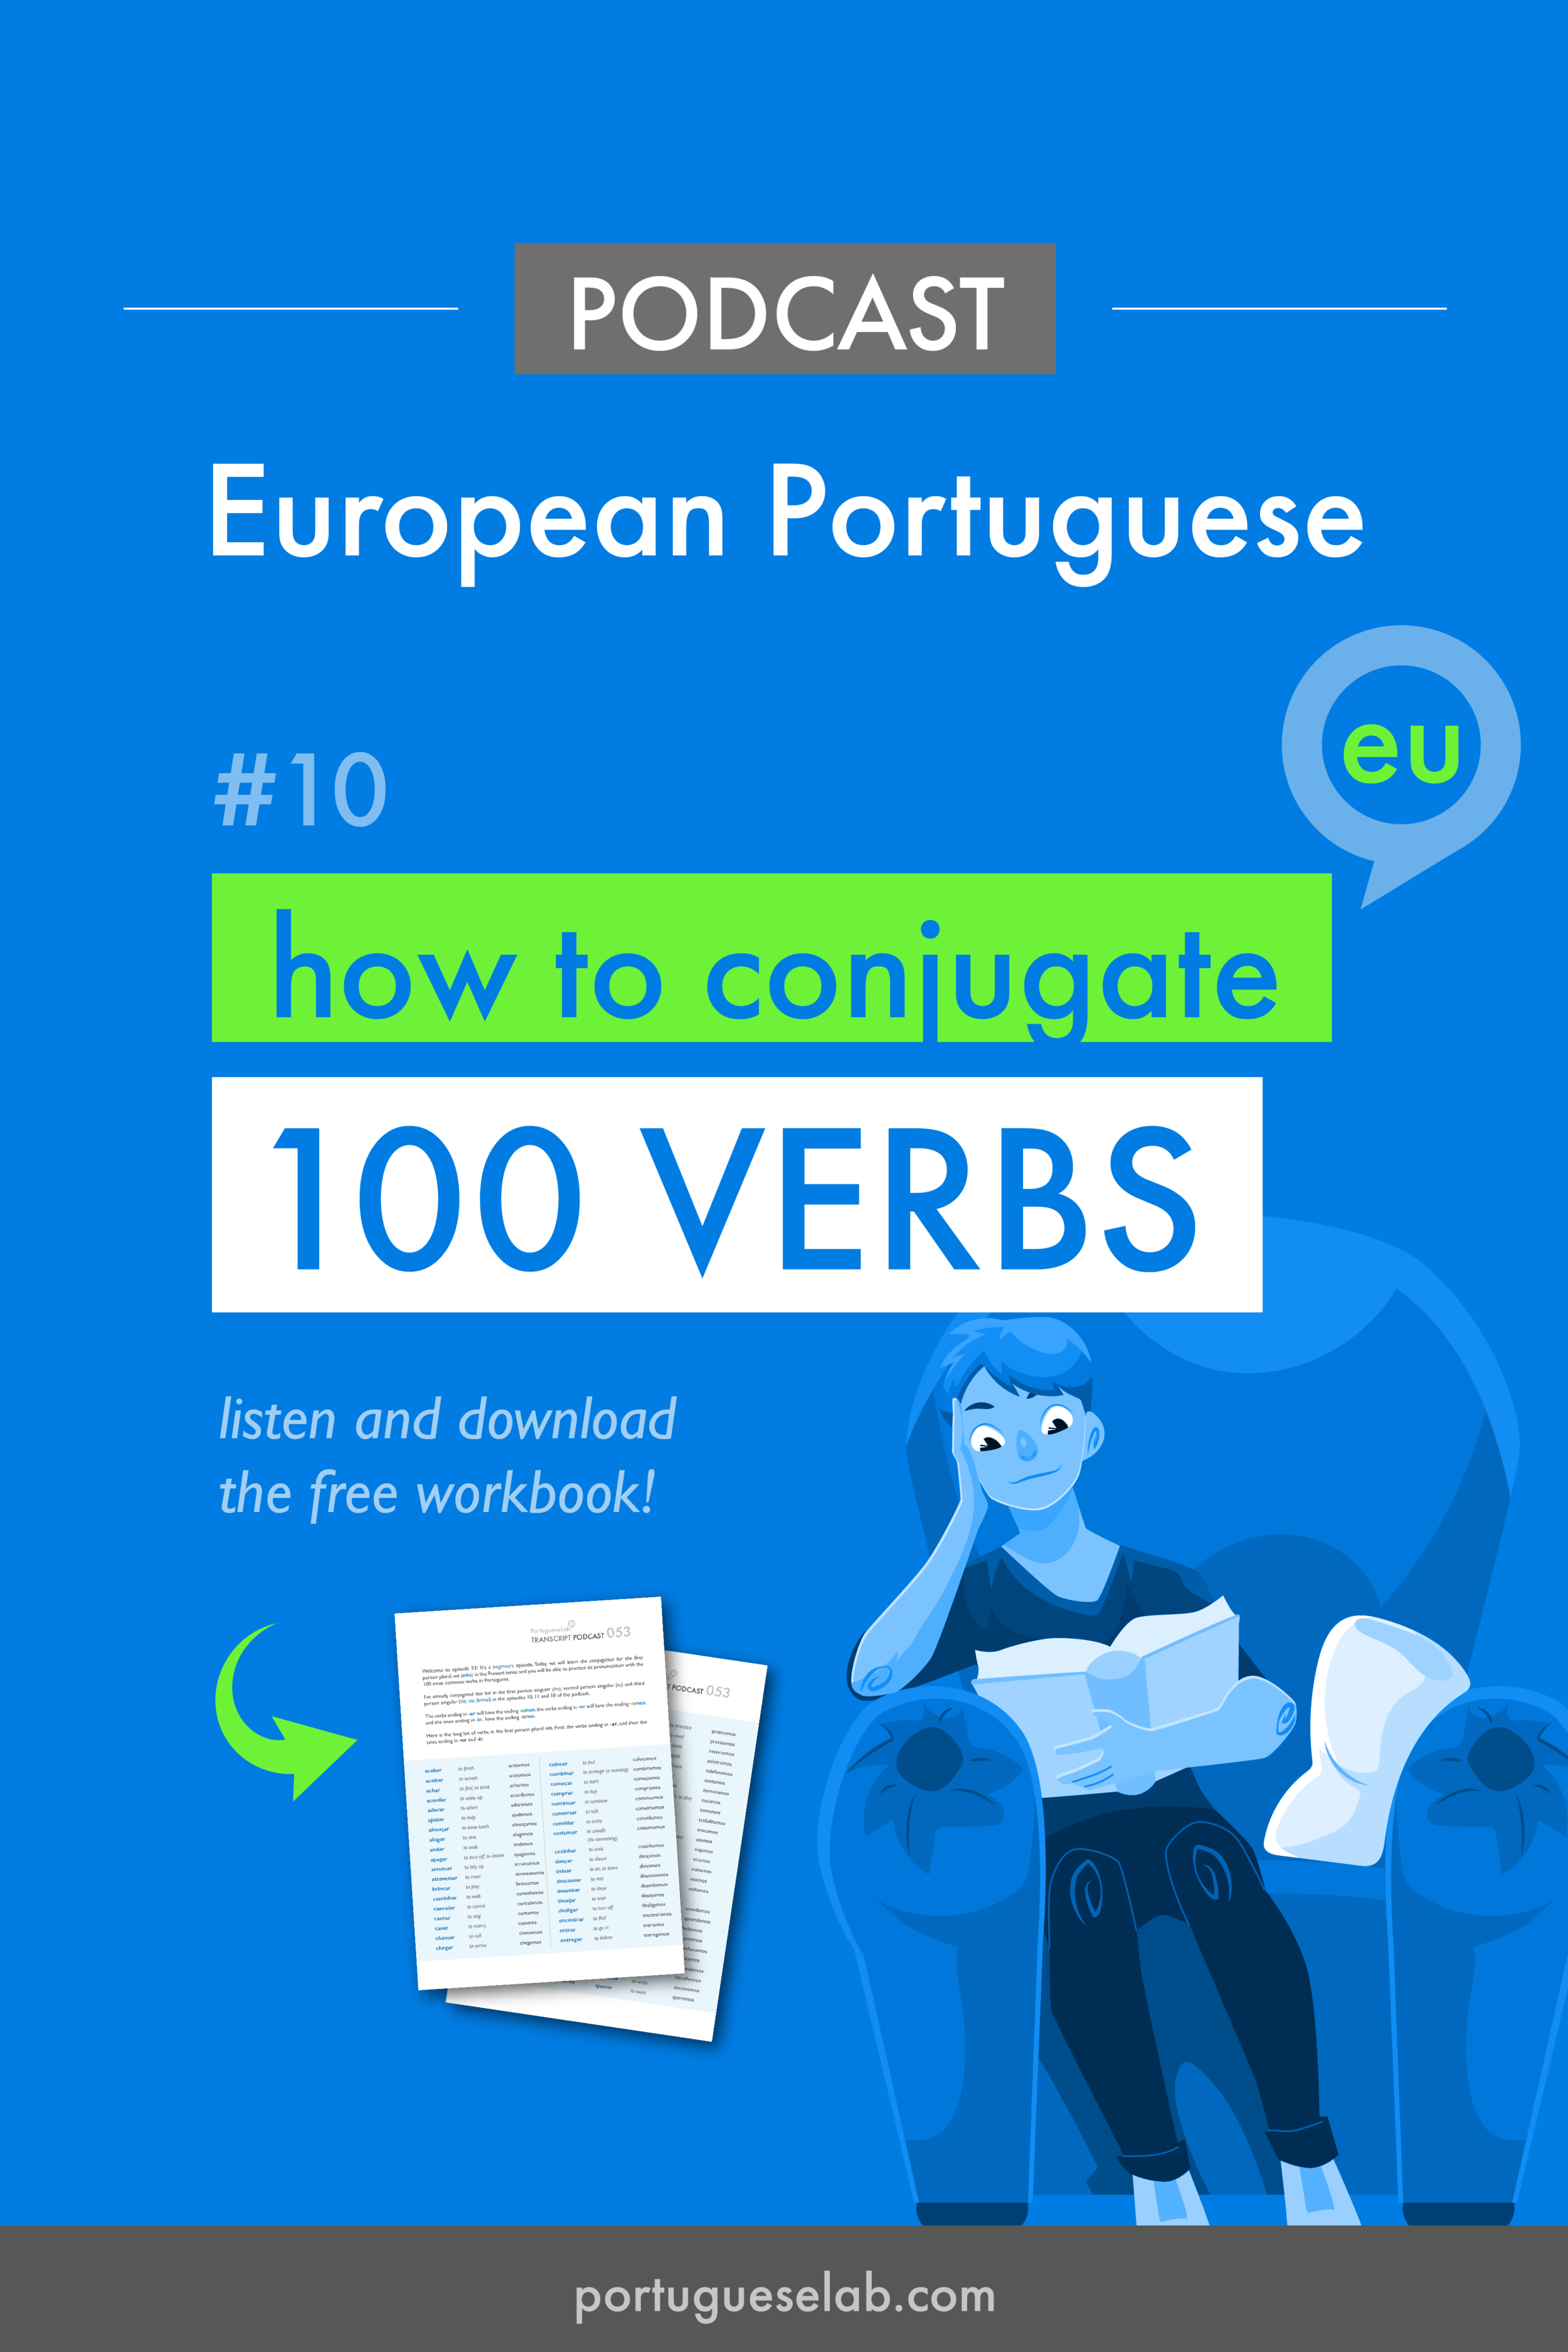 Portuguese Lab Podcast - European Portuguese - 10 - Verb conjugation - eu.png